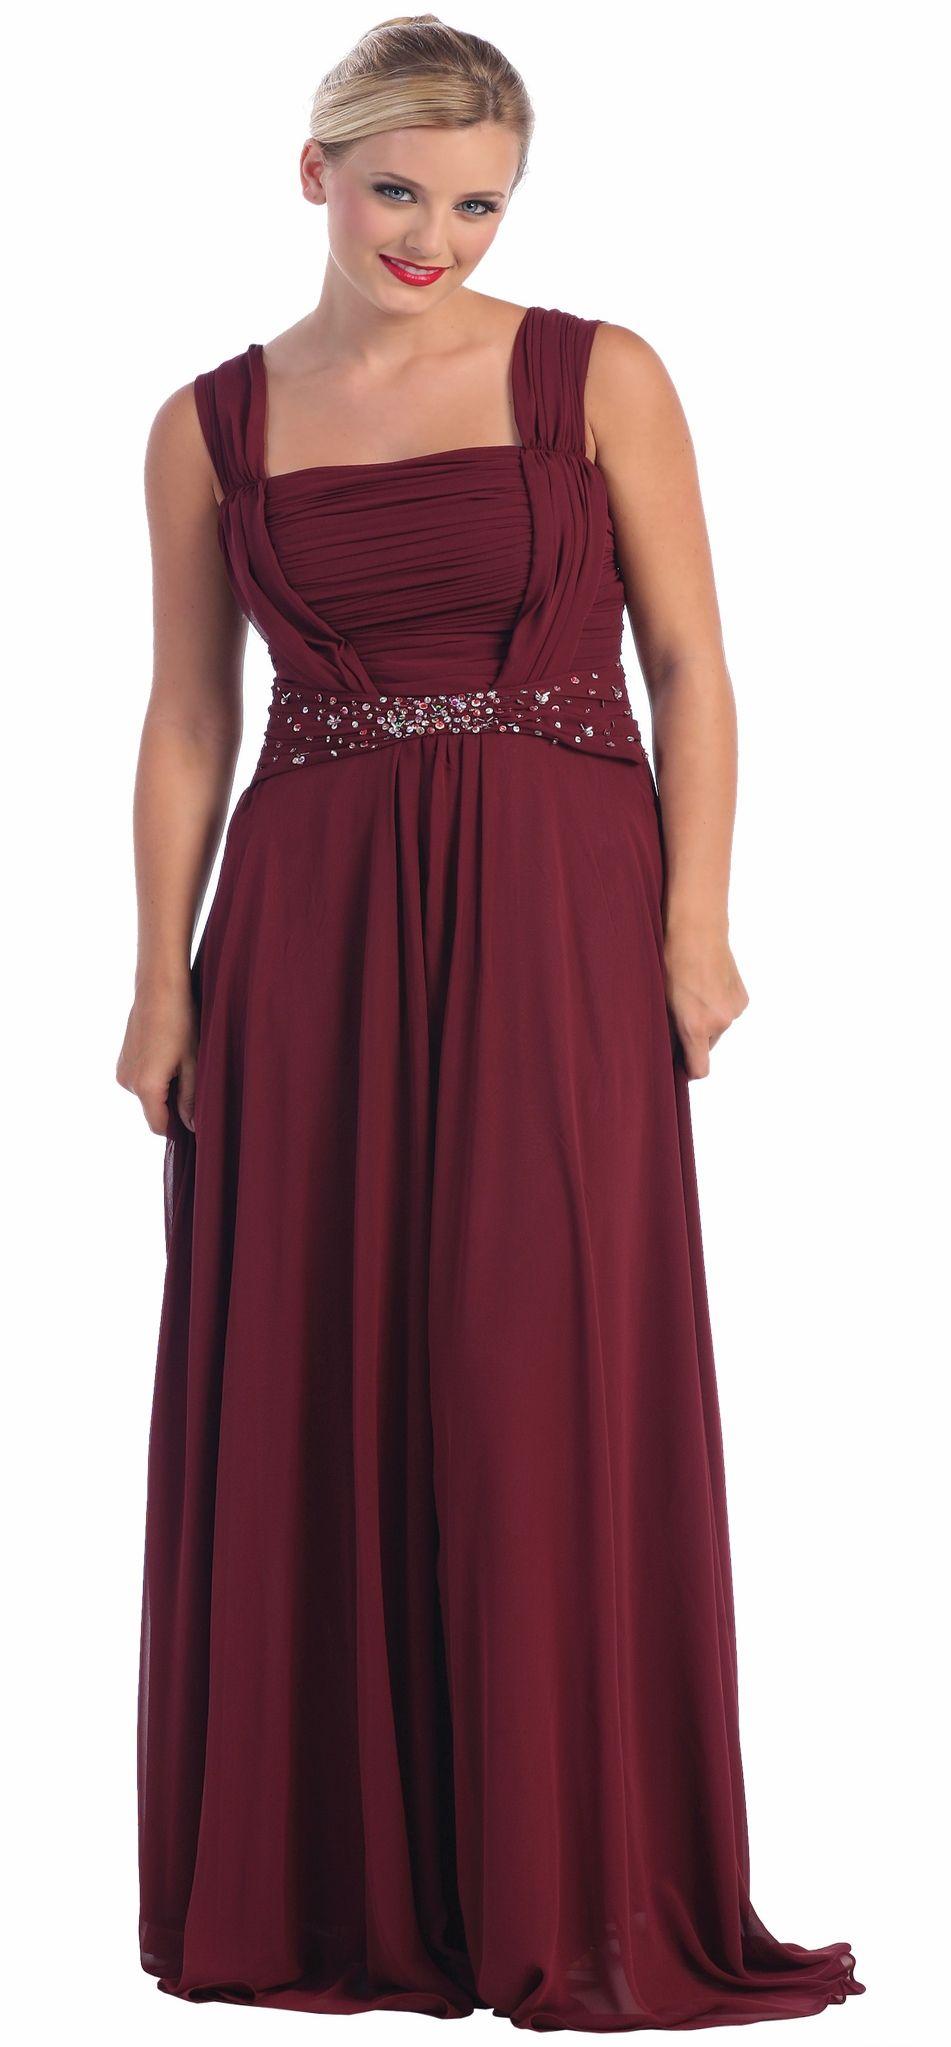 Burgundy Formal Dress Plus Size Chiffon Wide Straps Sequin Dress $177.99